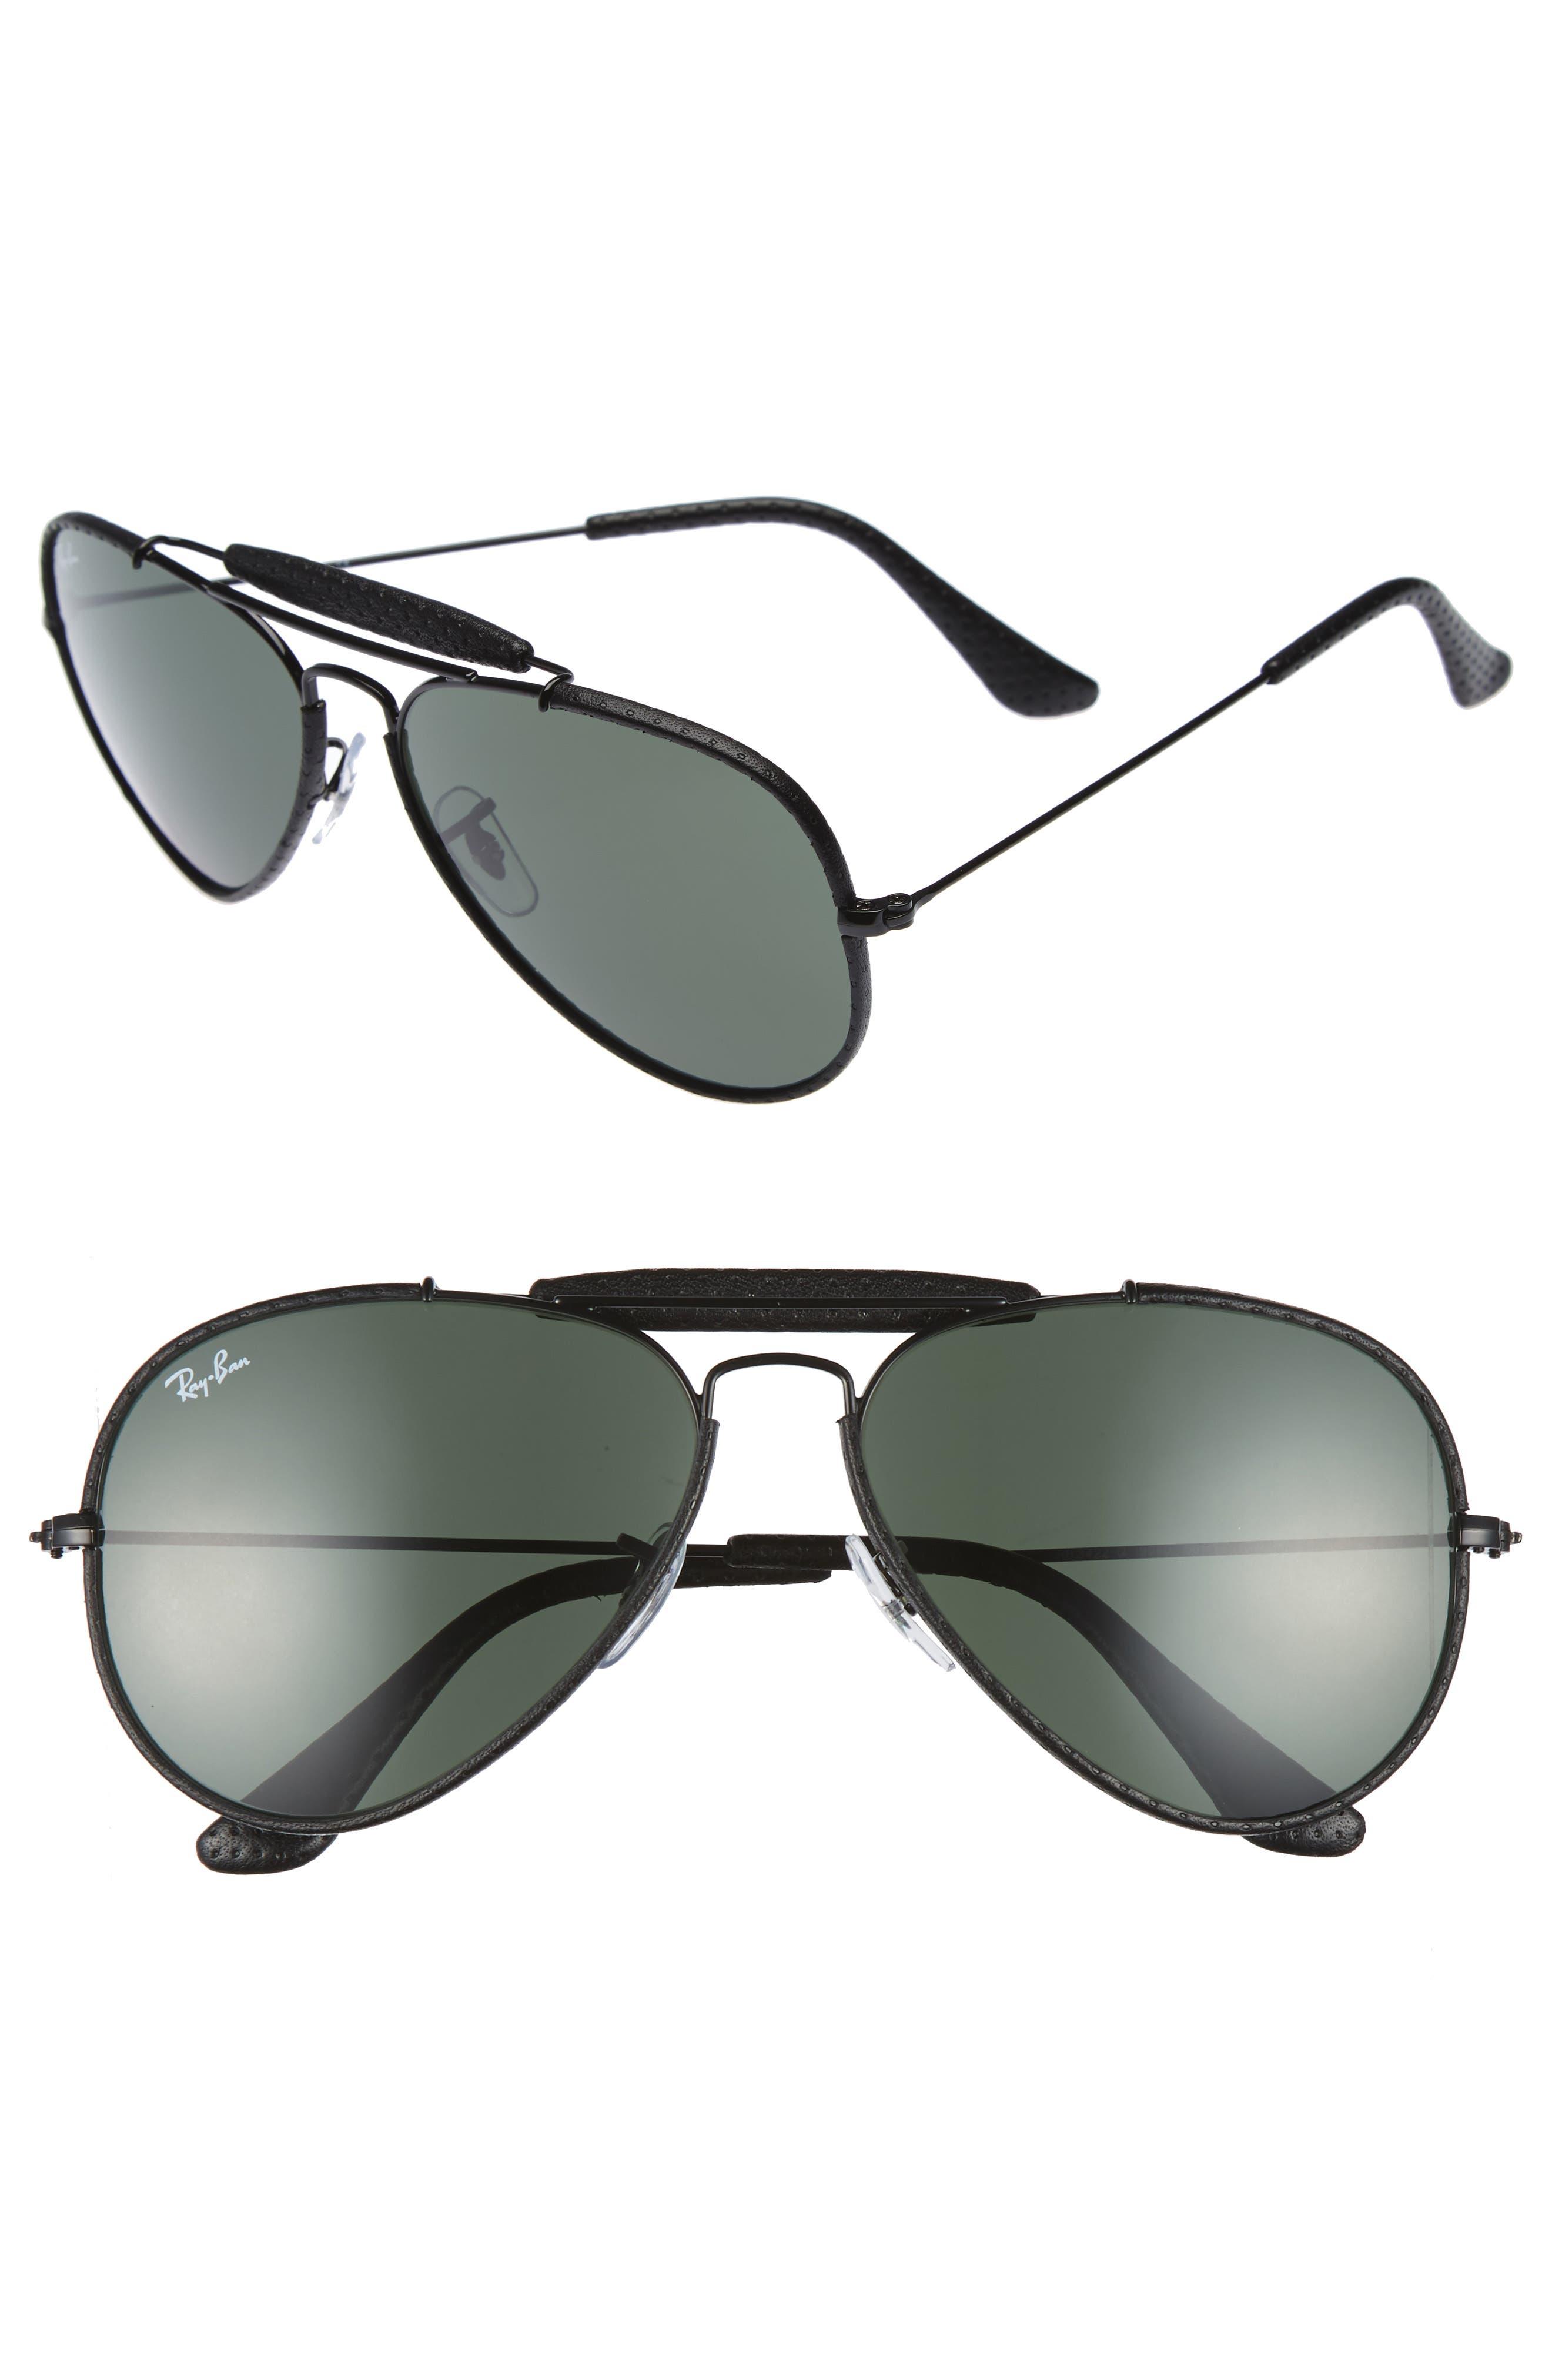 Ray-Ban Outdoorsman 58mm Aviator Sunglasses